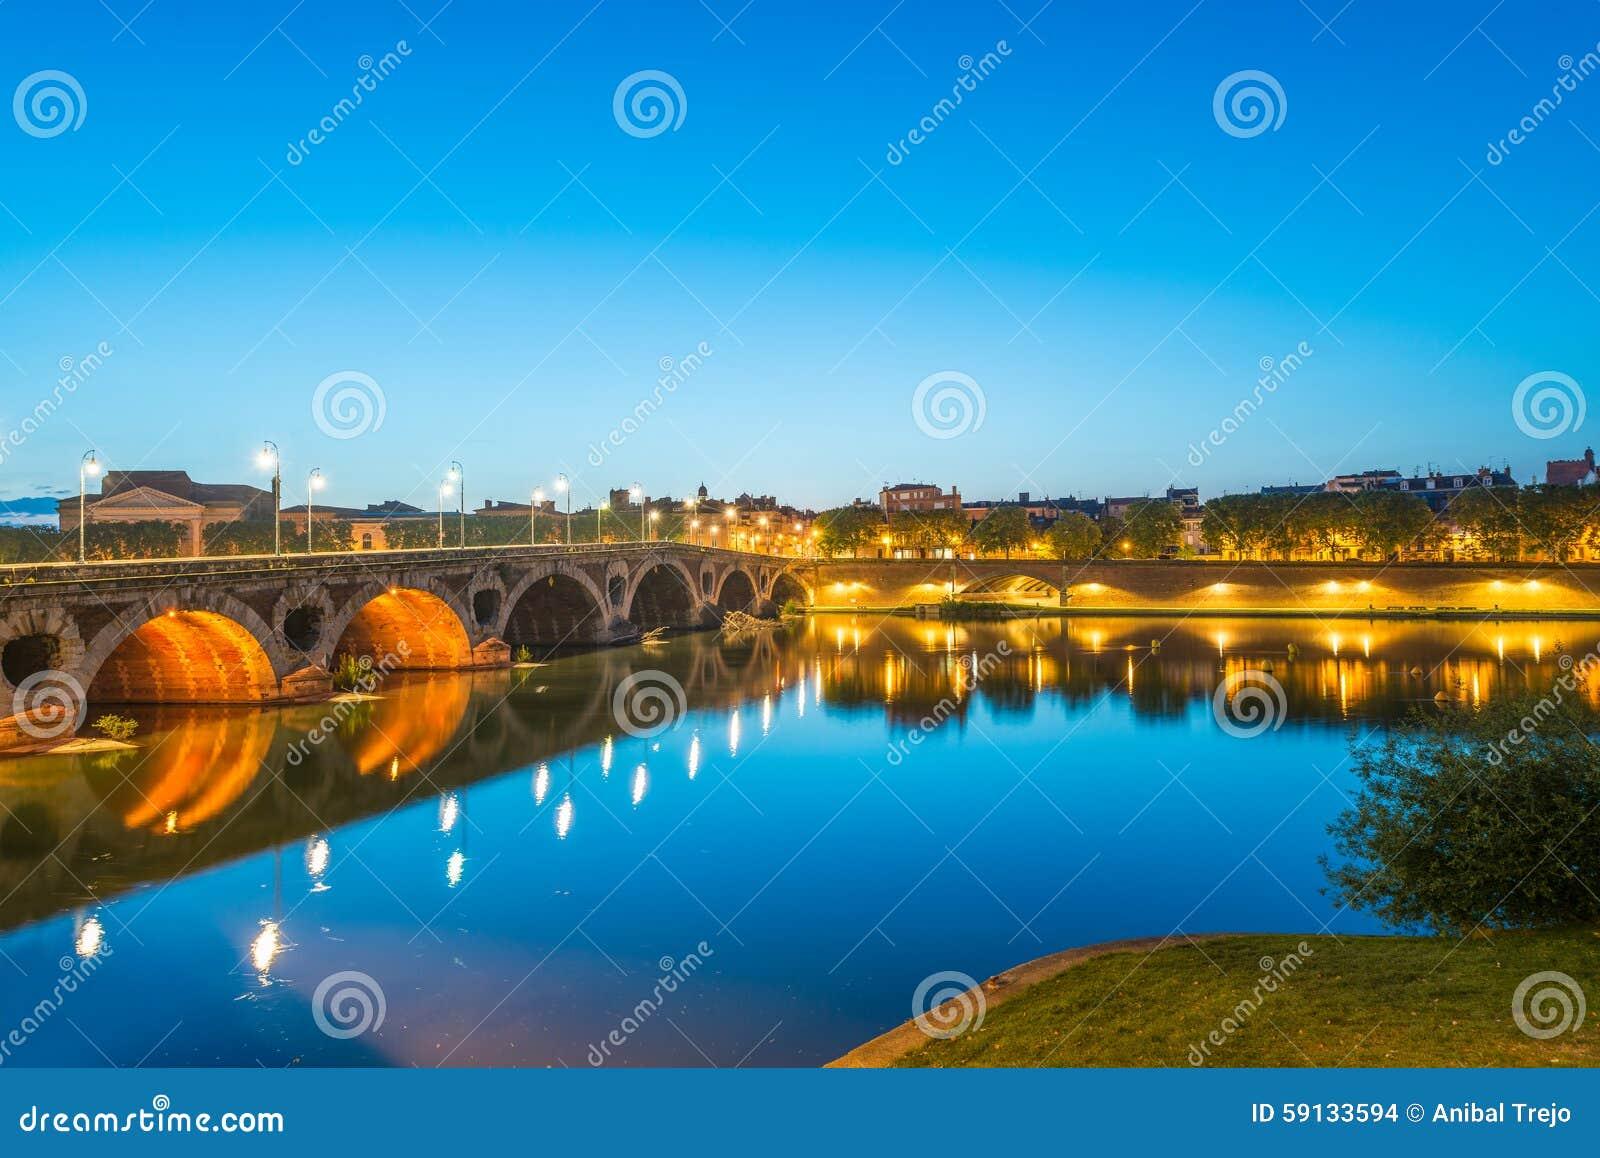 Pont Neuf à Toulouse, France